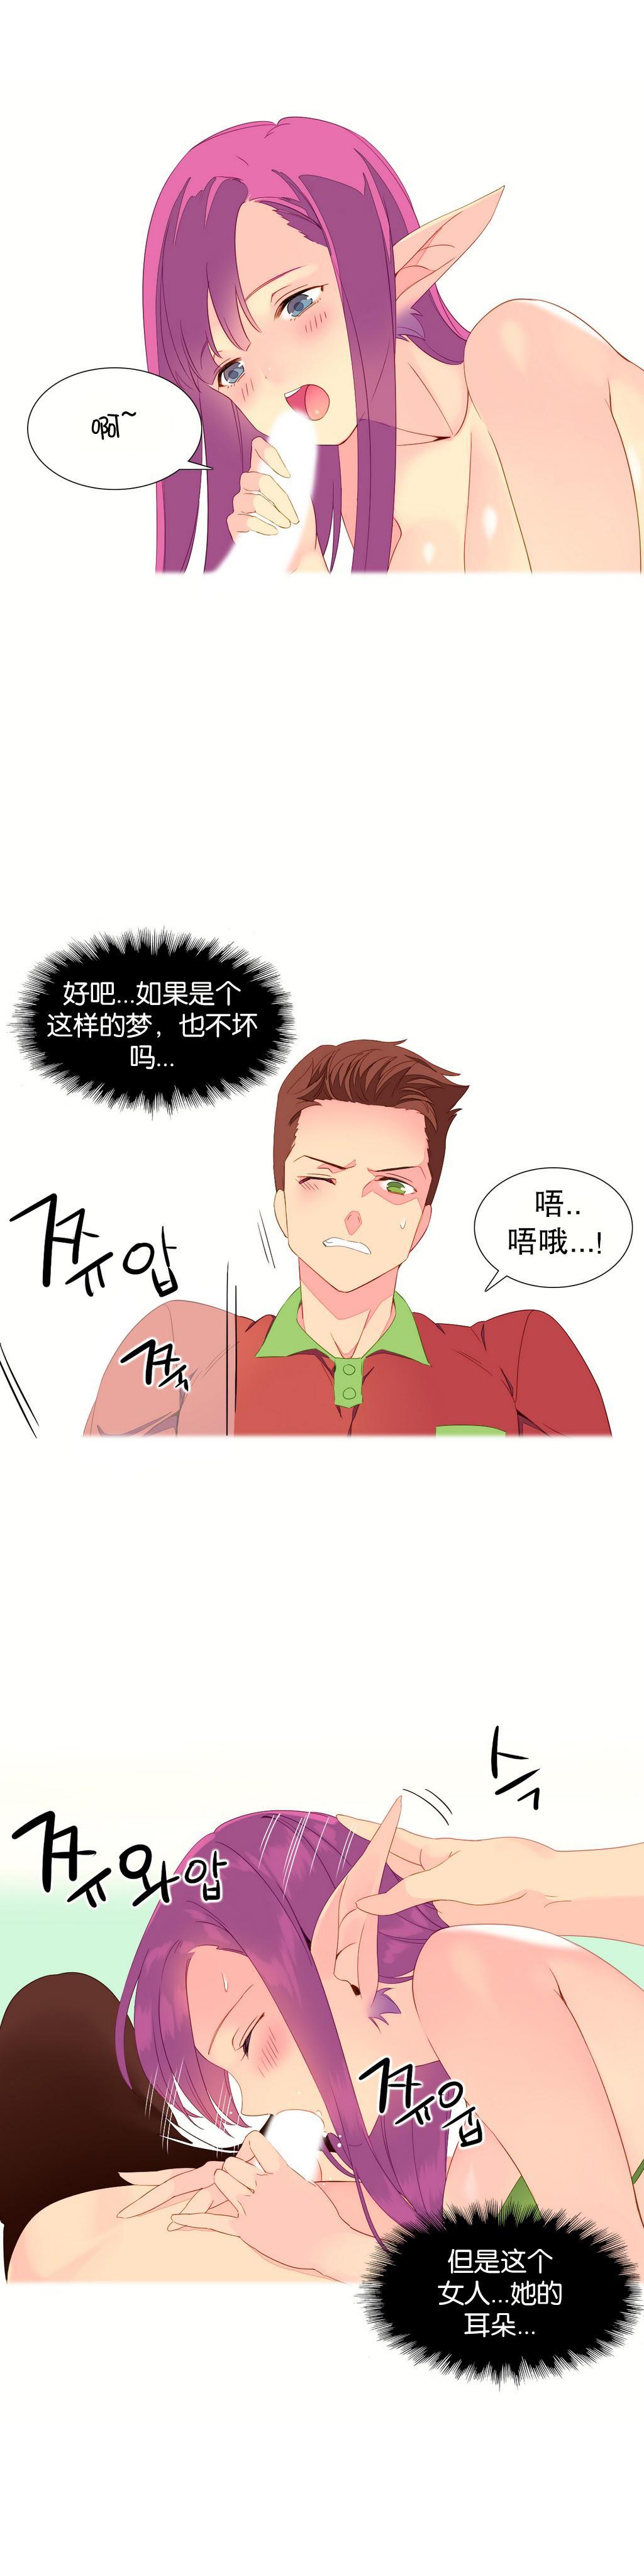 [Rozer] 一个由我统治的世界(A World that I Rule) Ch.1-3 [Chinese] 46